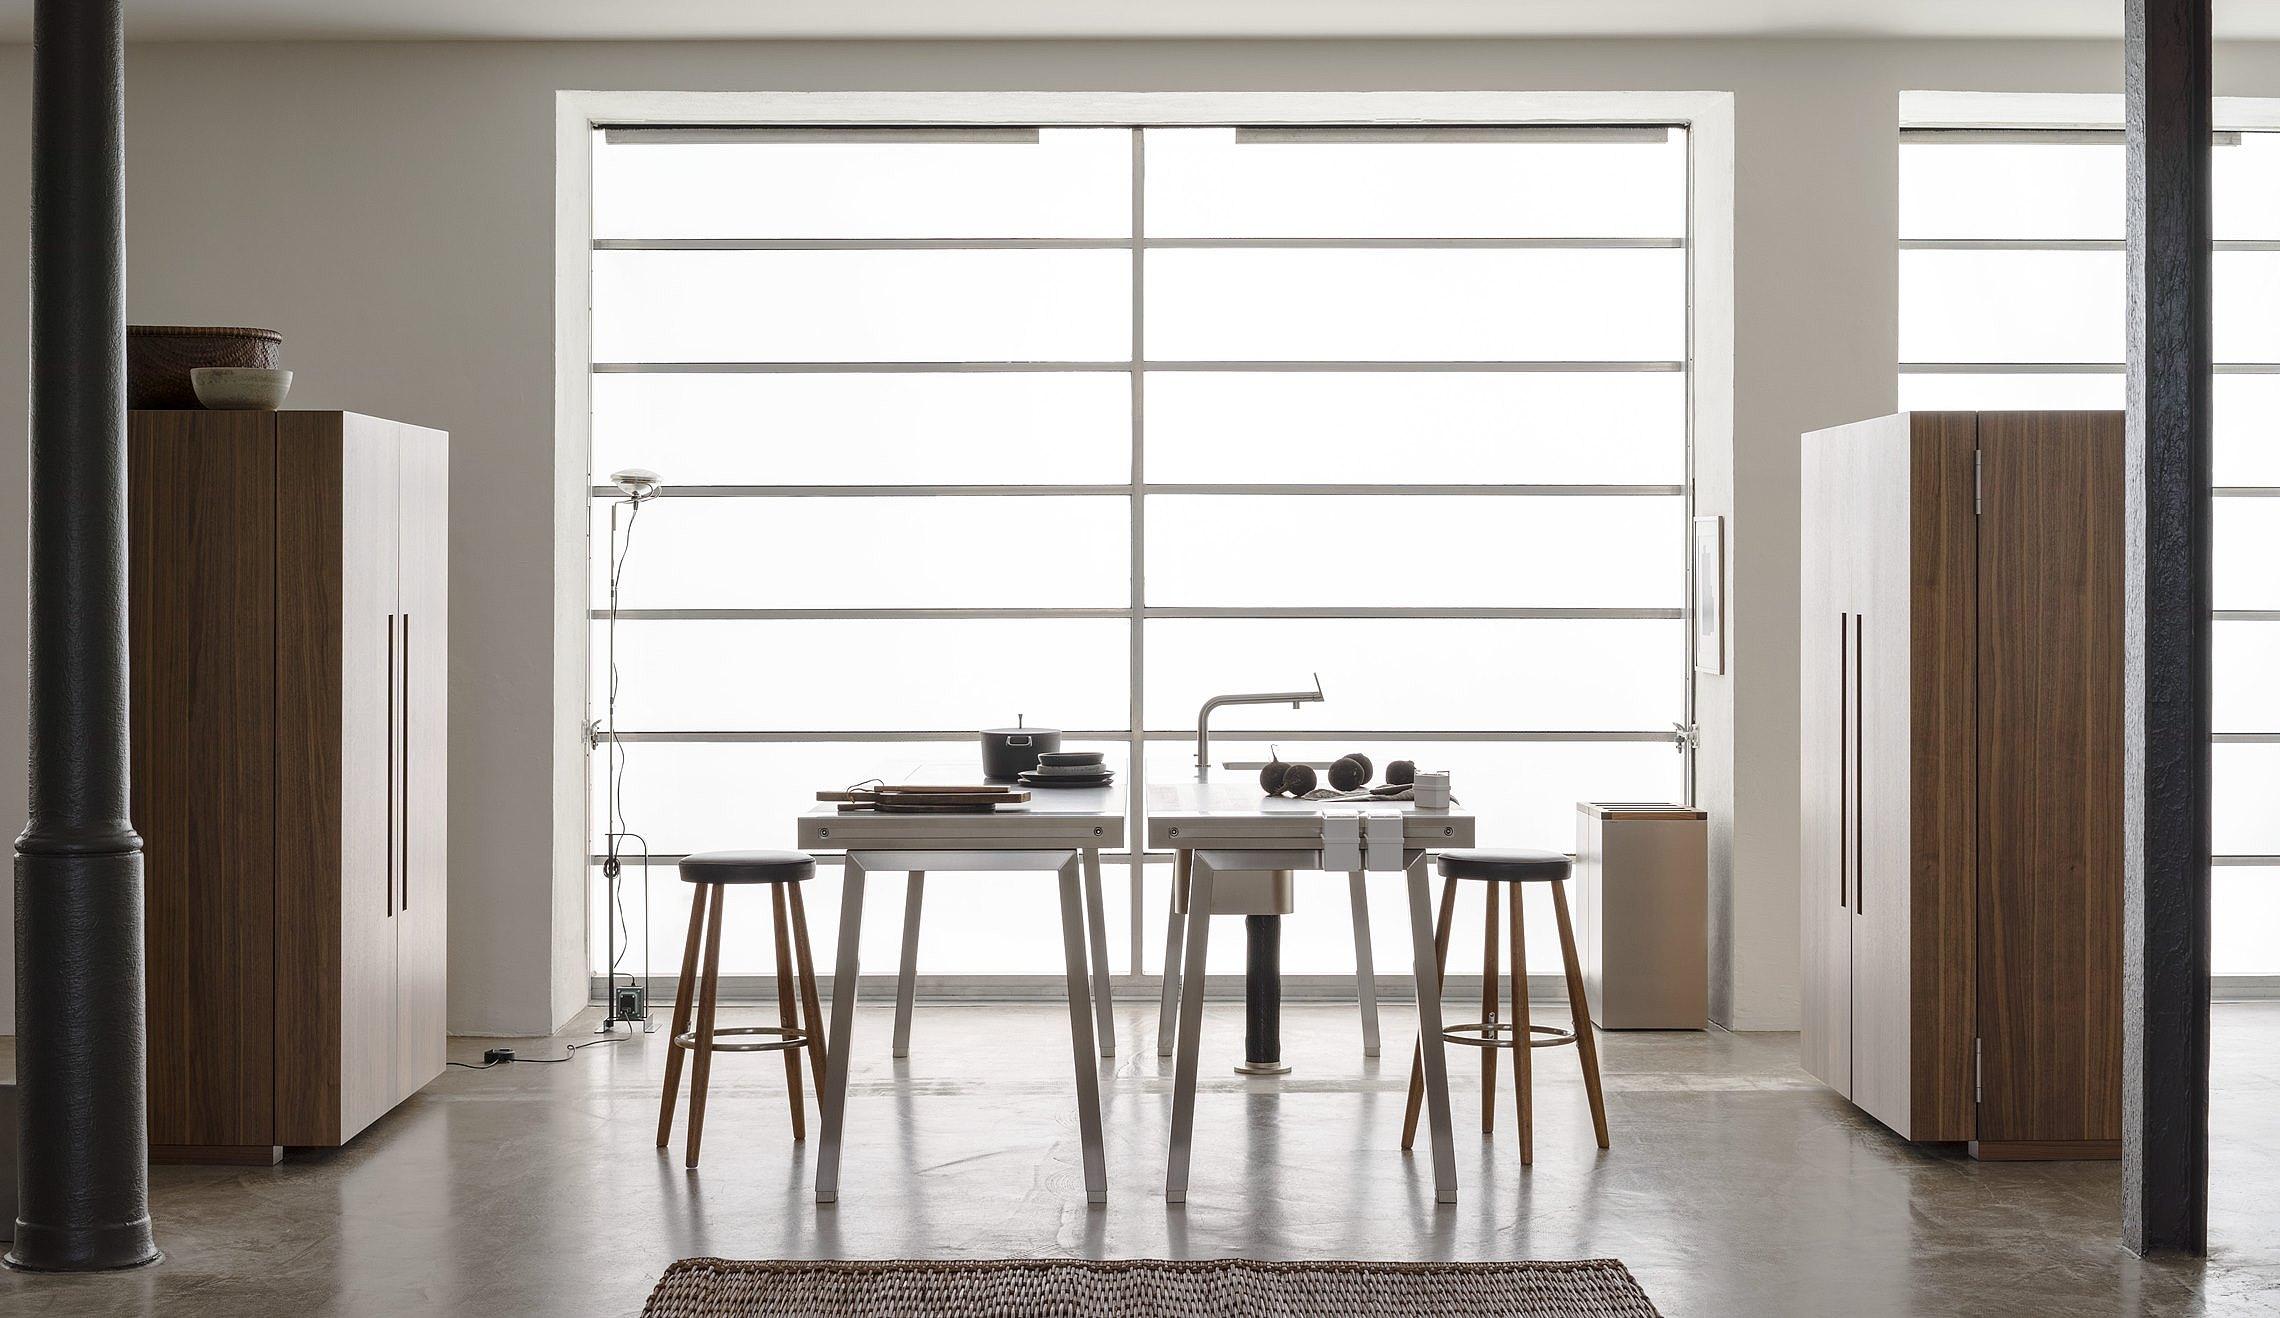 b2 bulthaup. Black Bedroom Furniture Sets. Home Design Ideas